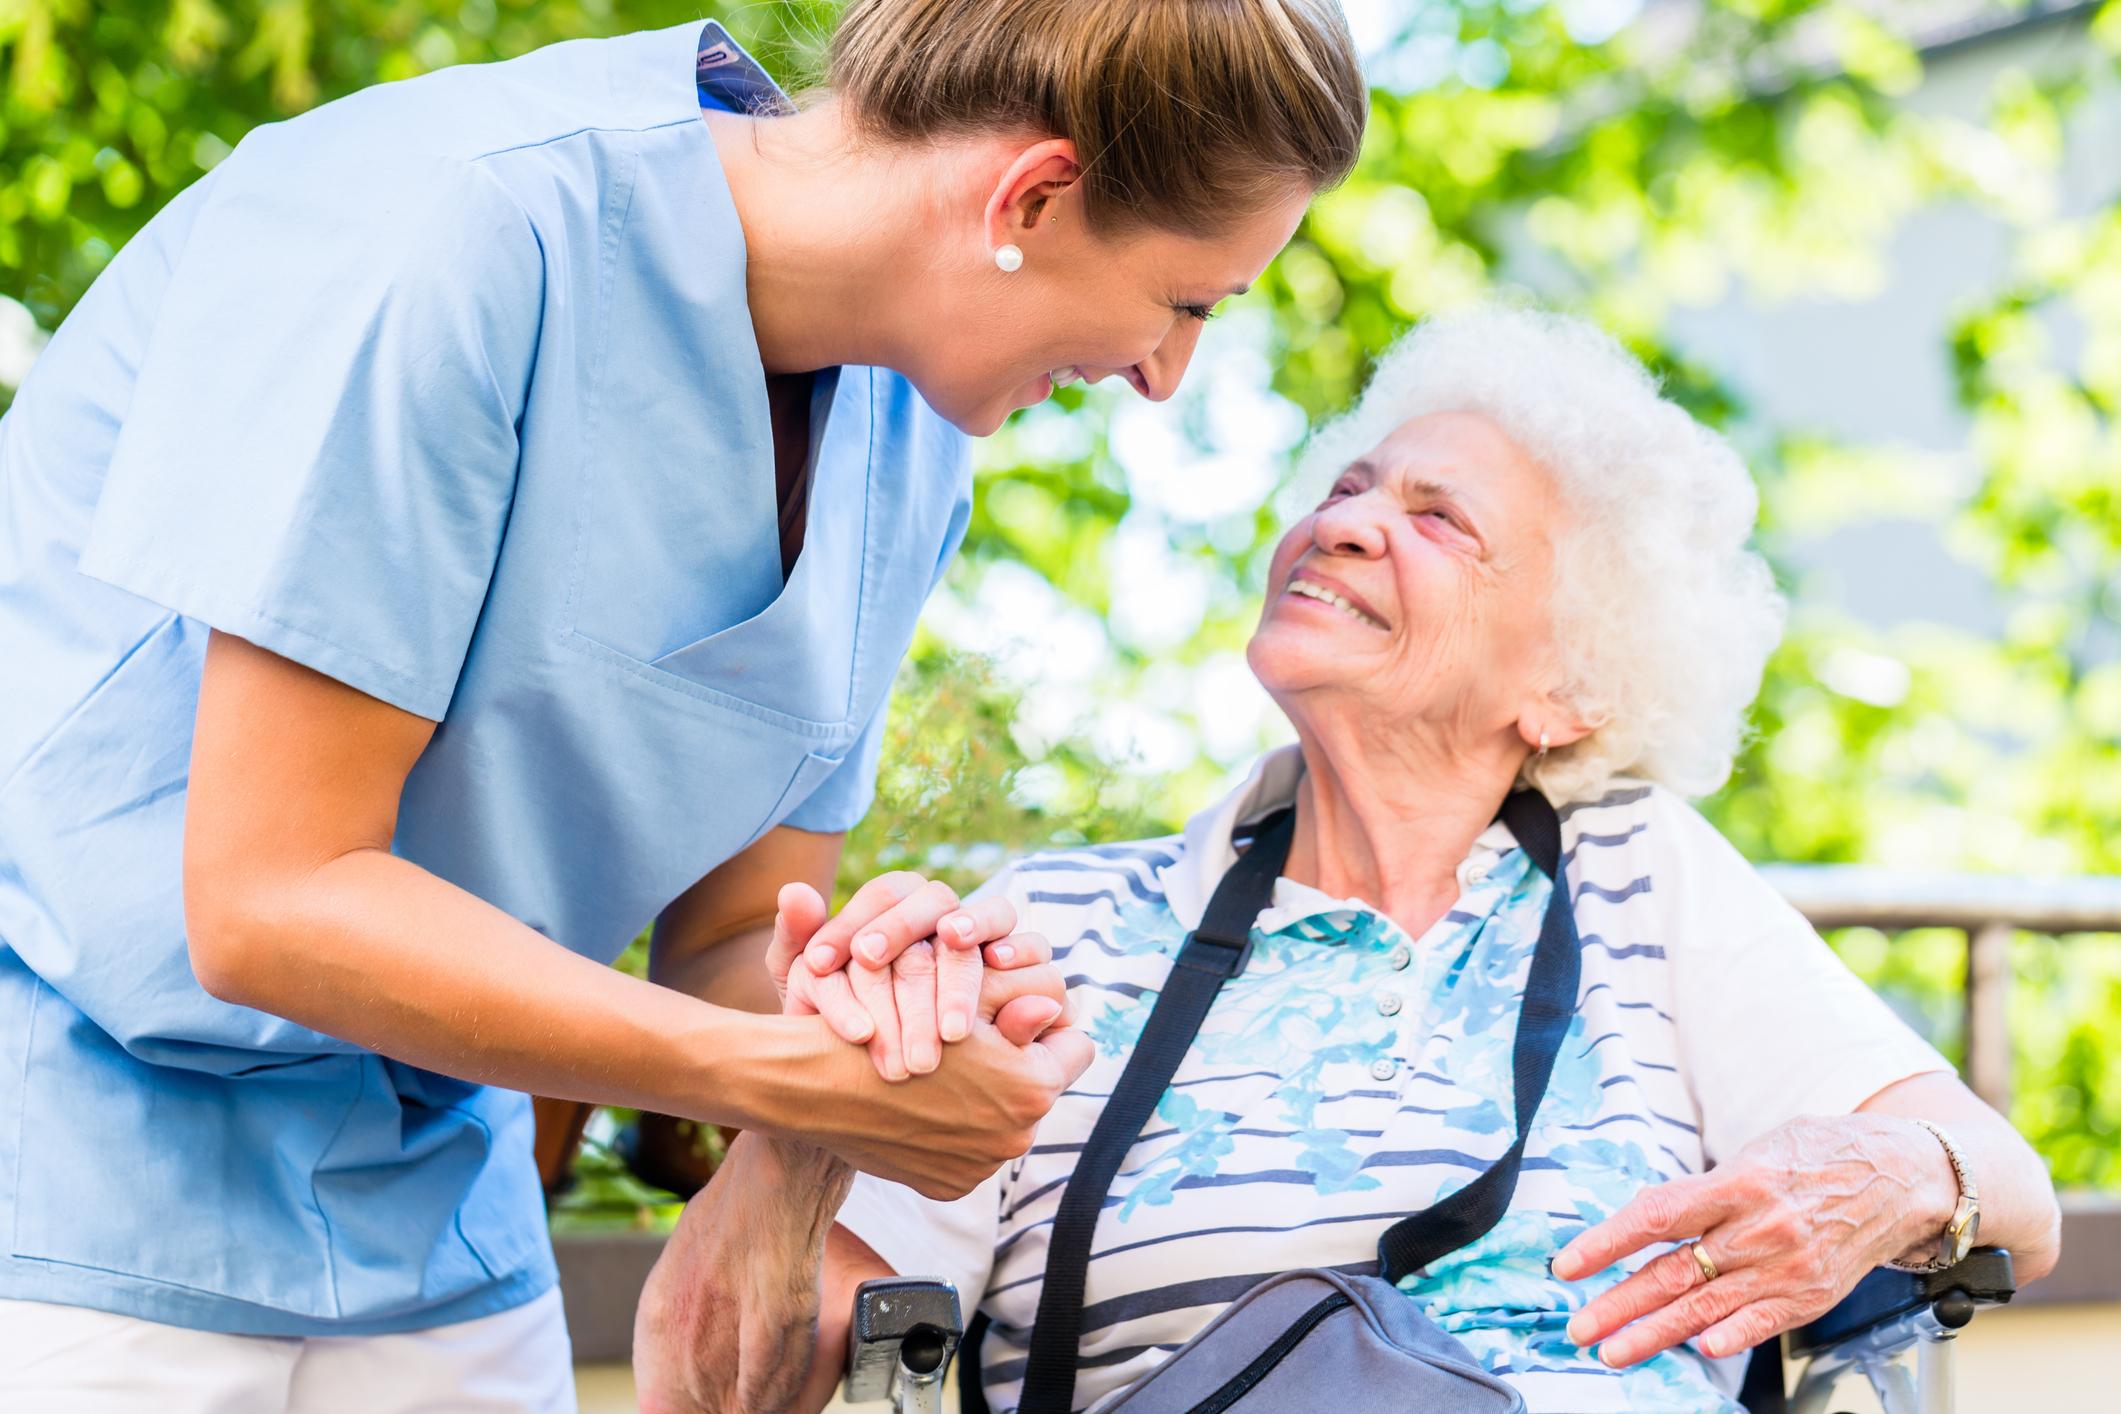 Caregiver tending to elderly woman